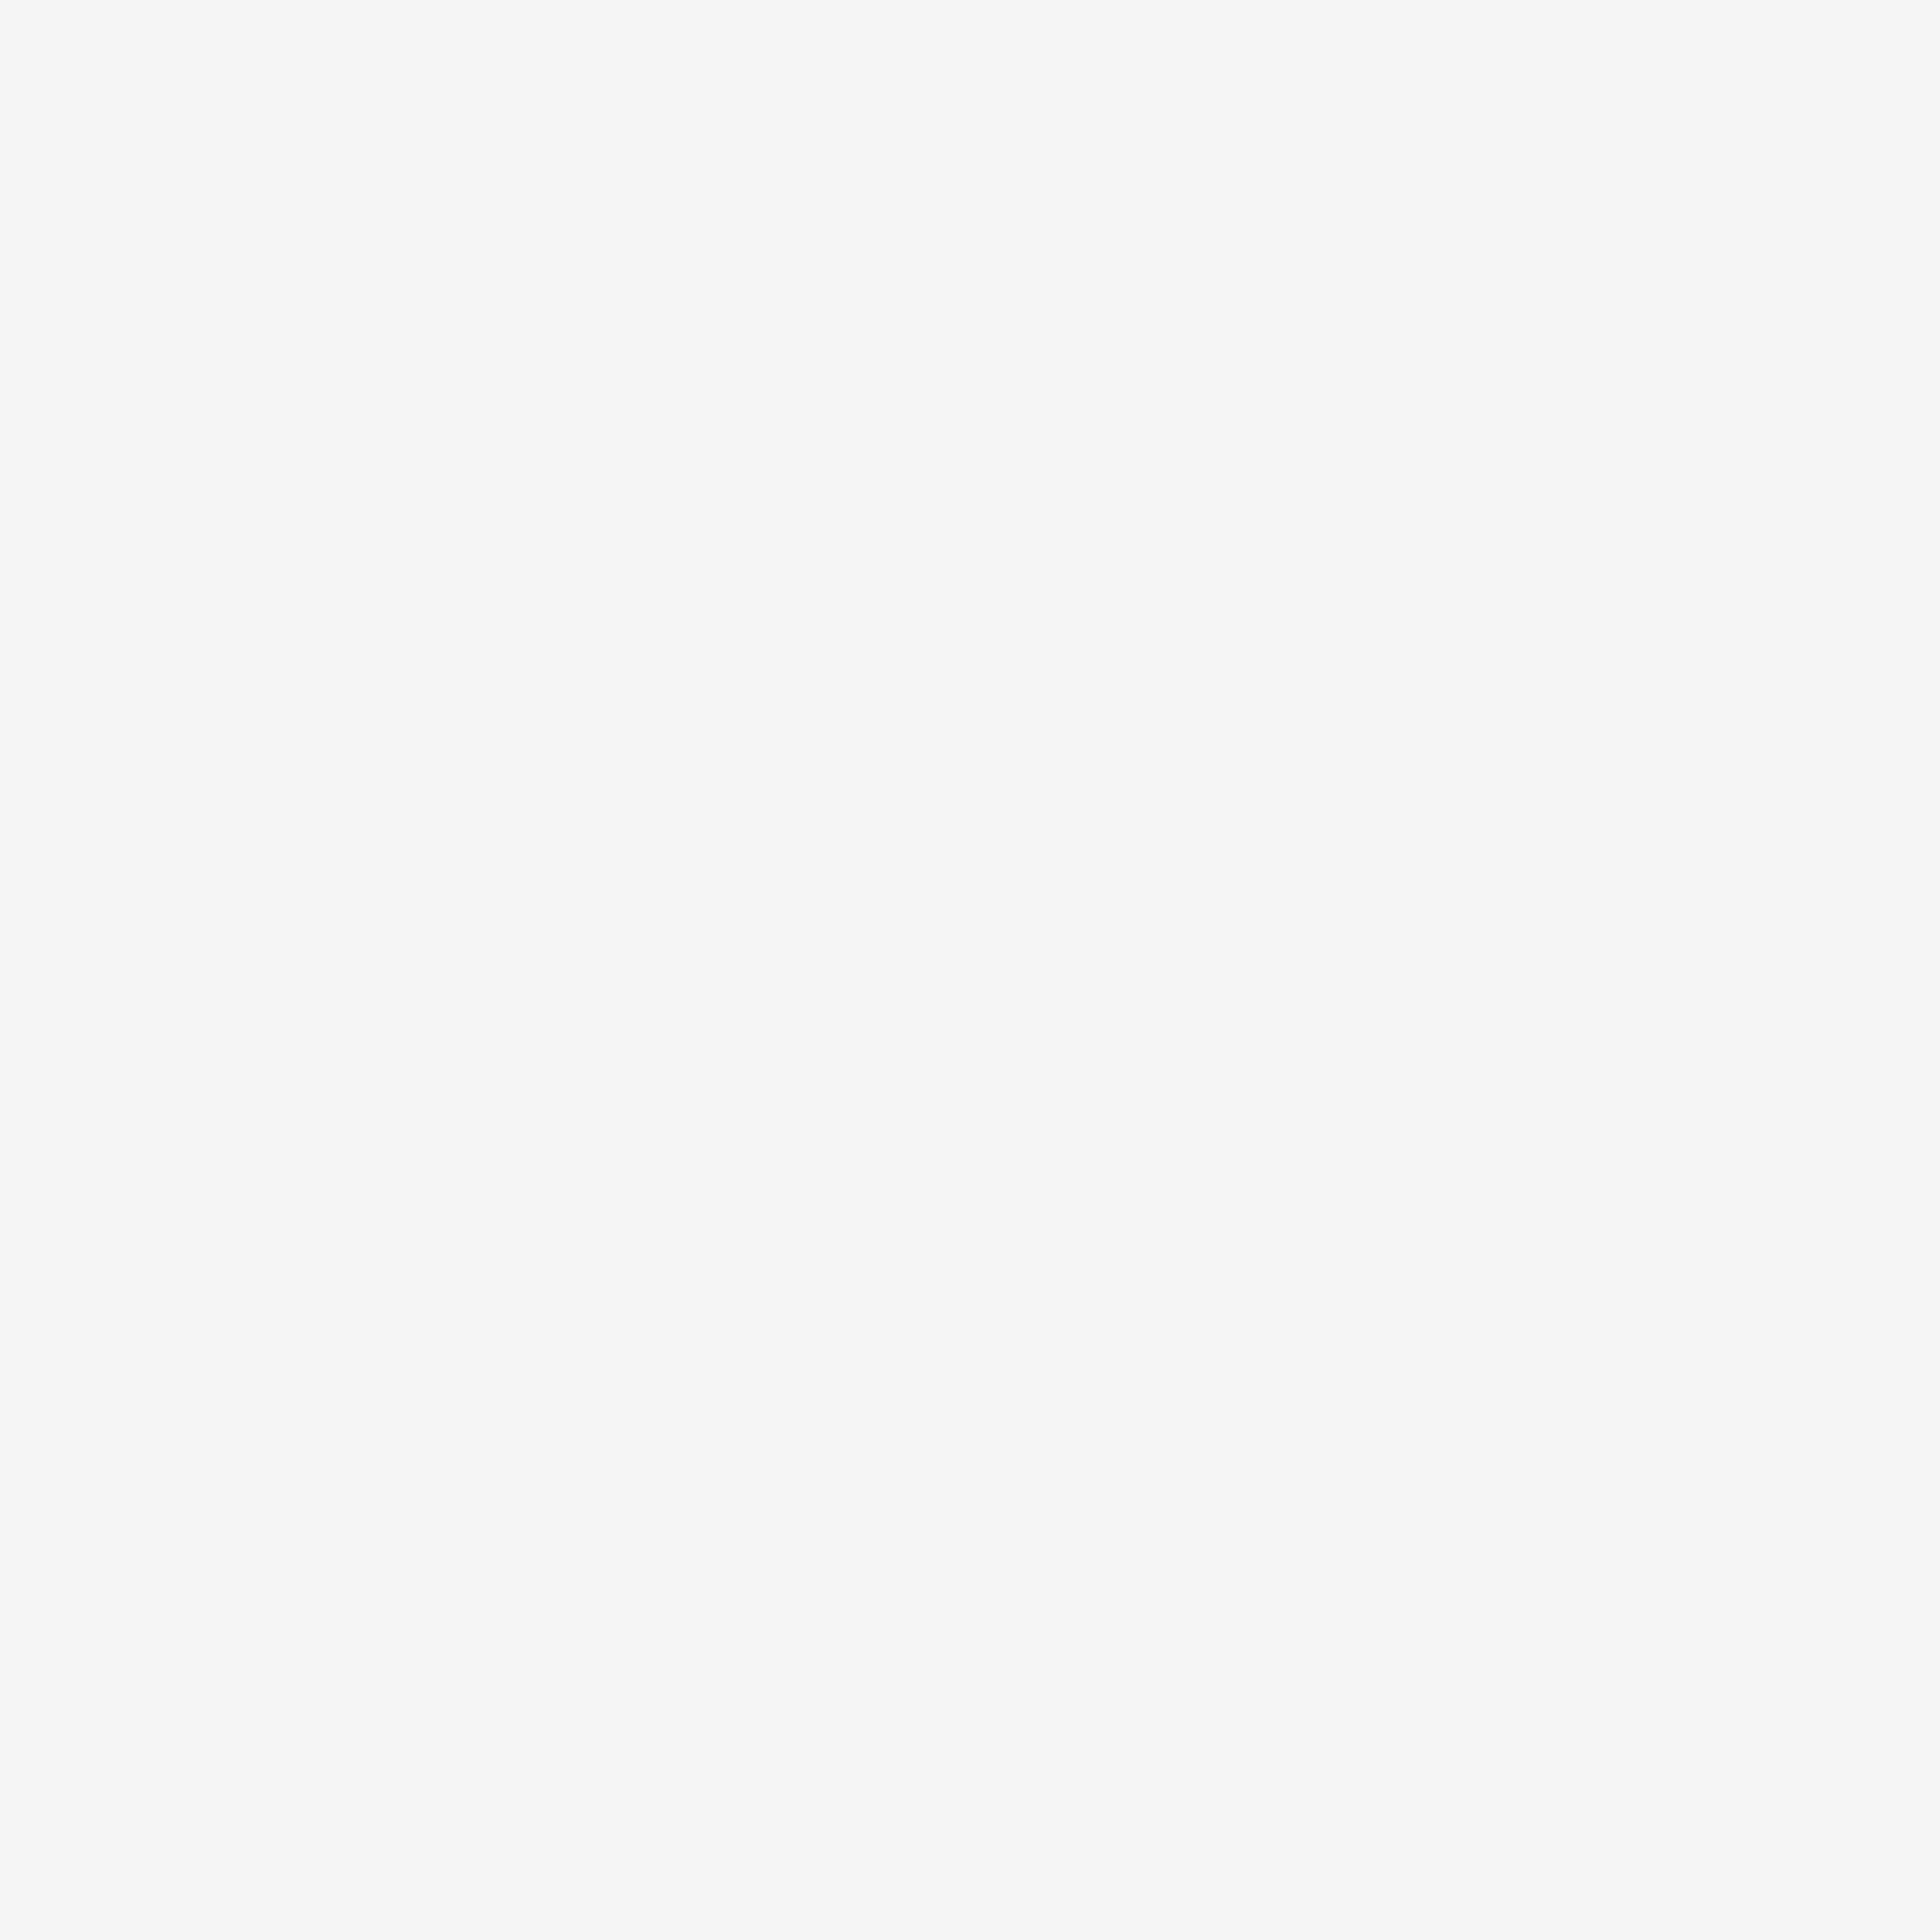 cfe86687a08 Puma xTC basket CVS order online   Oxener Shoes